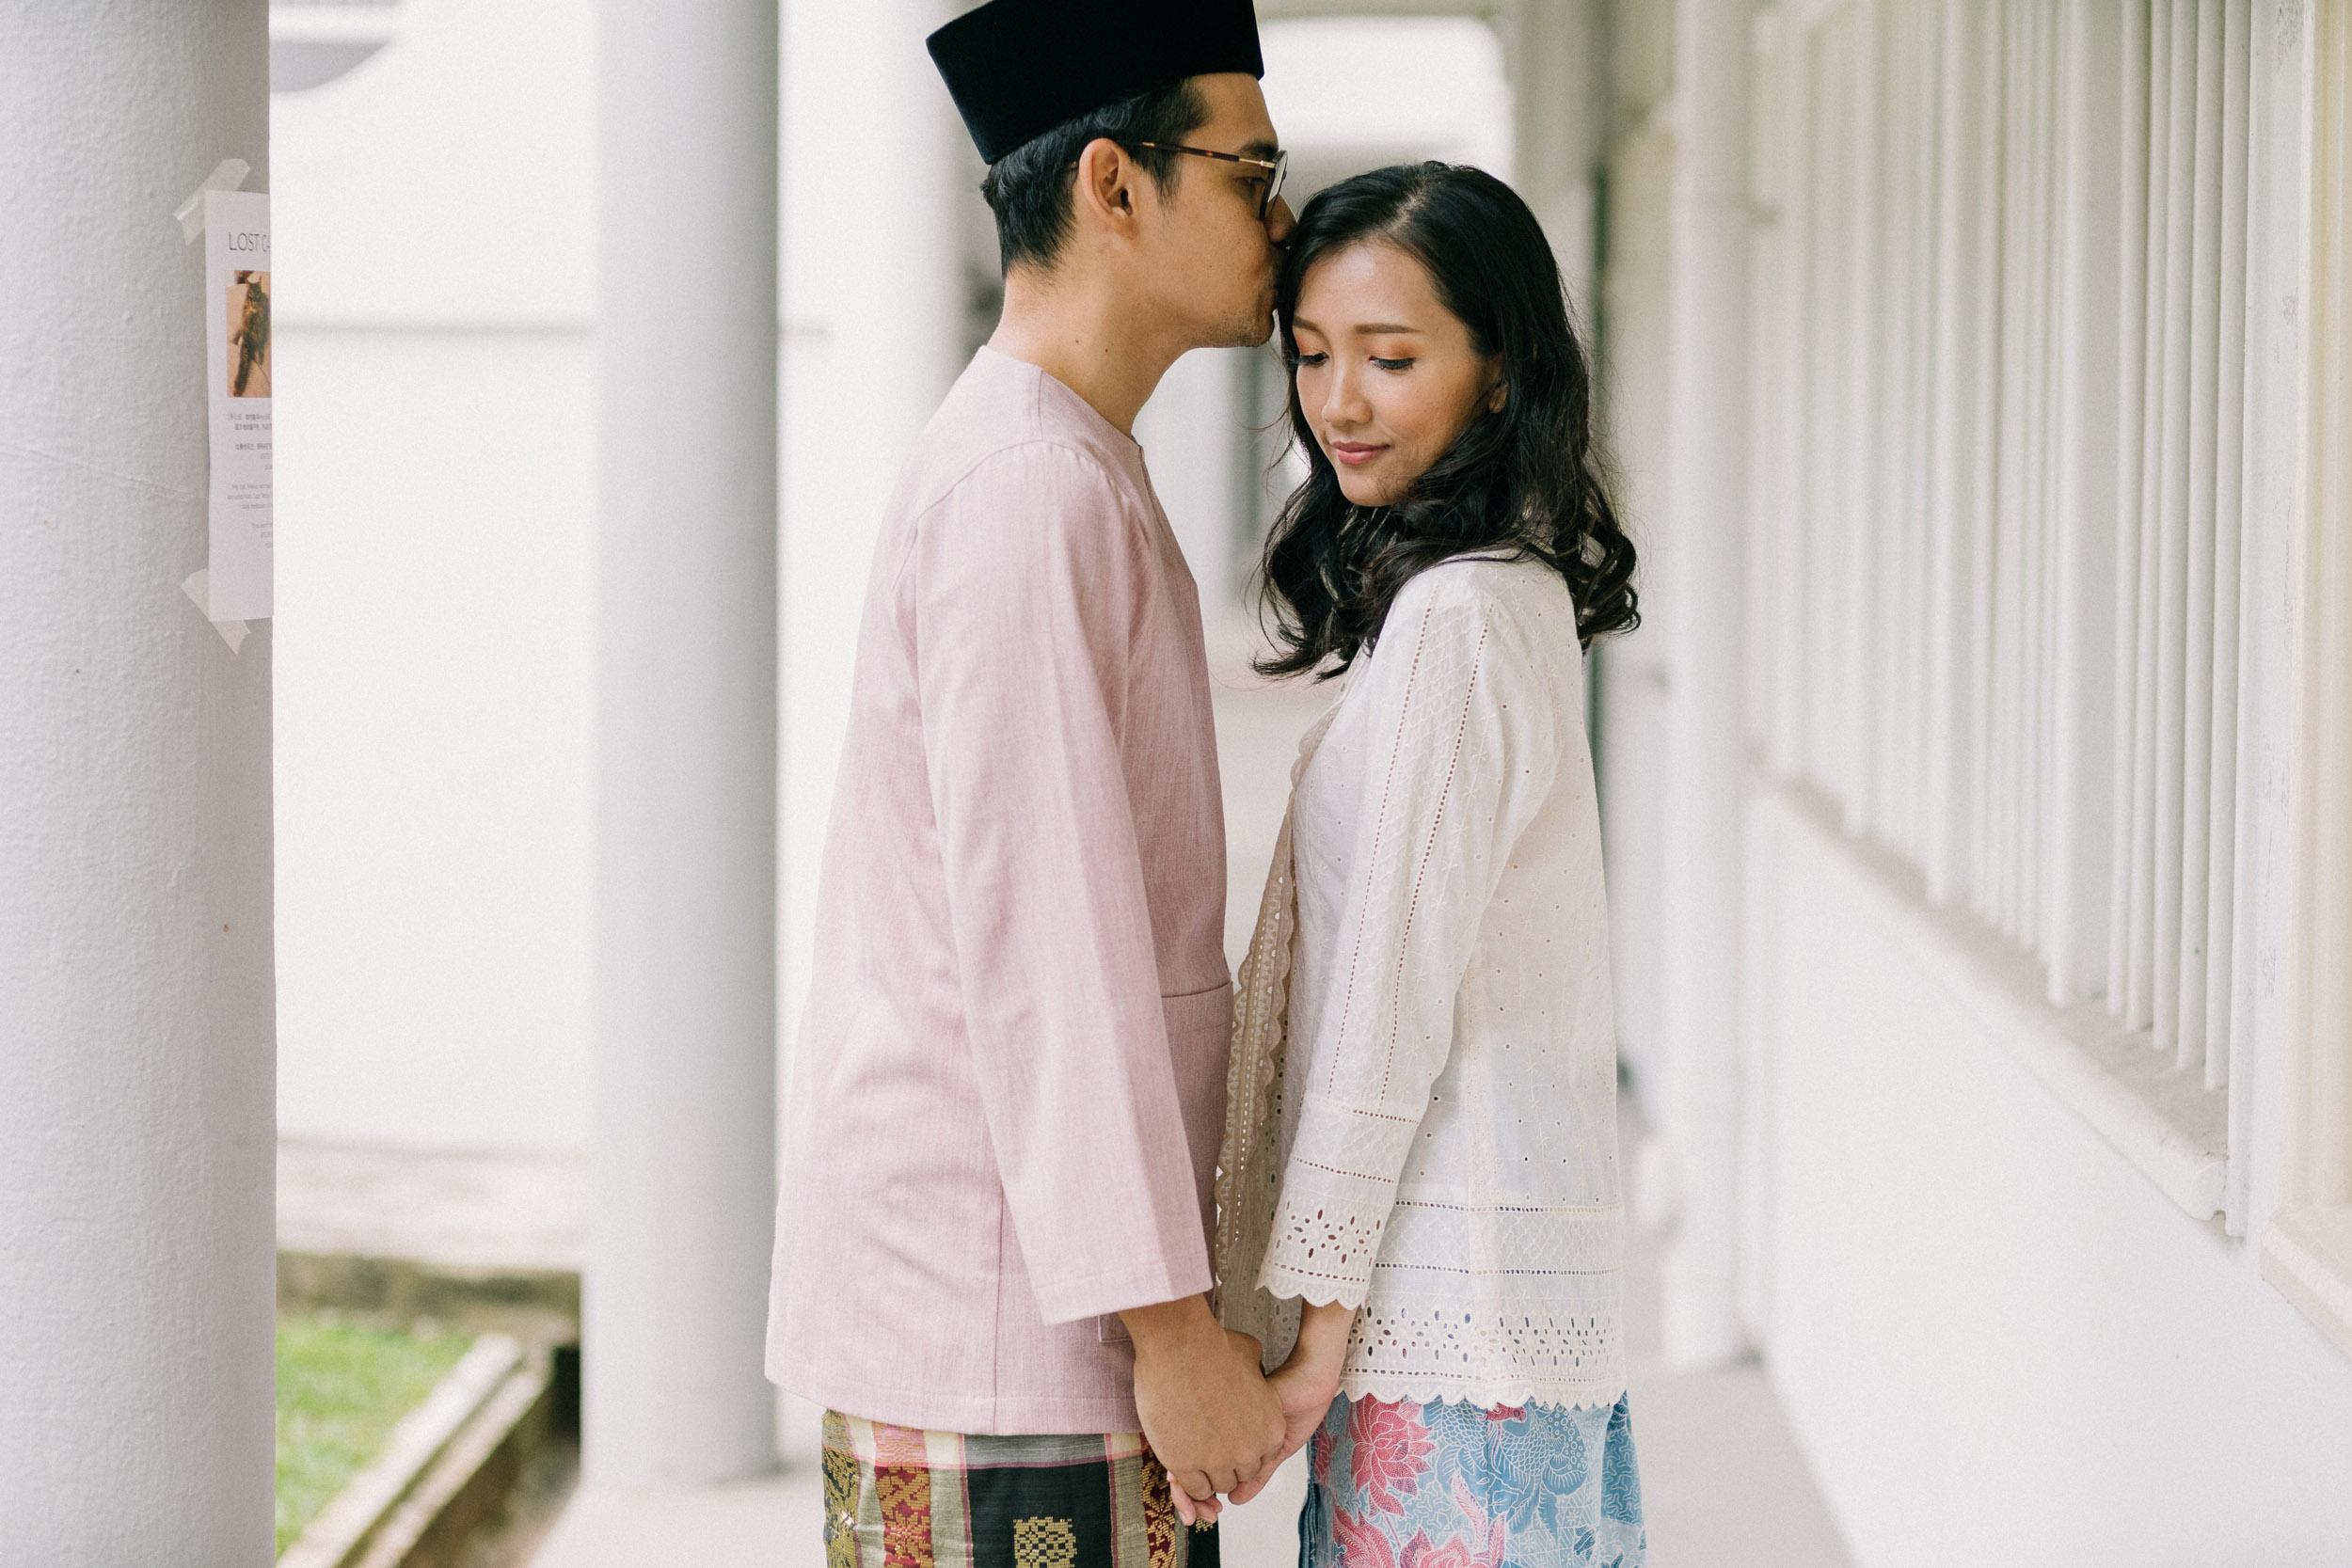 singapore-wedding-photographer-wemadethese-adib-mizah-17.jpg